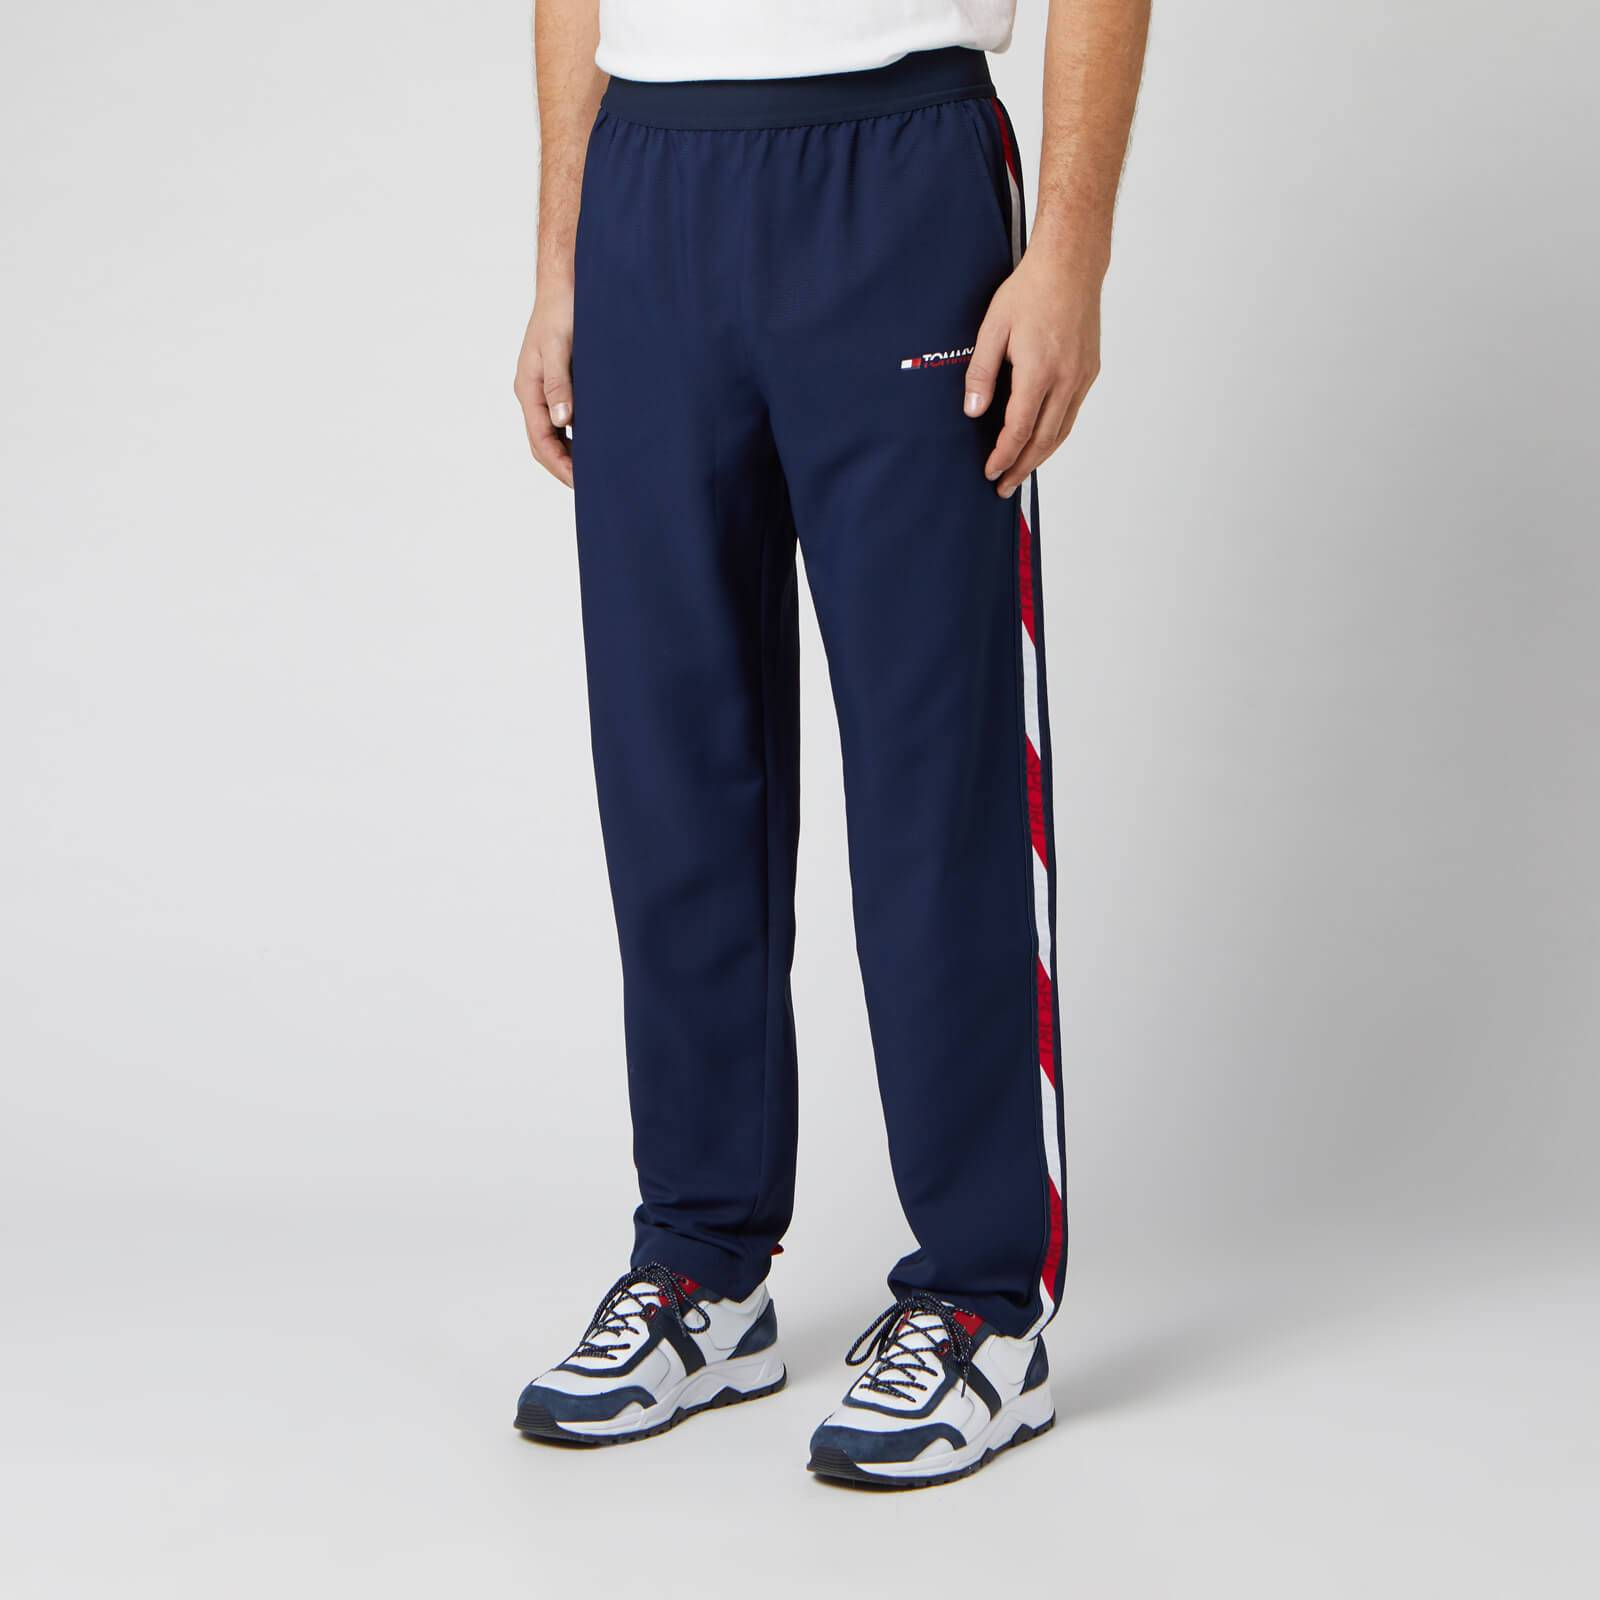 Tommy Sport Men's Woven Tape Pants - Sport Navy - M